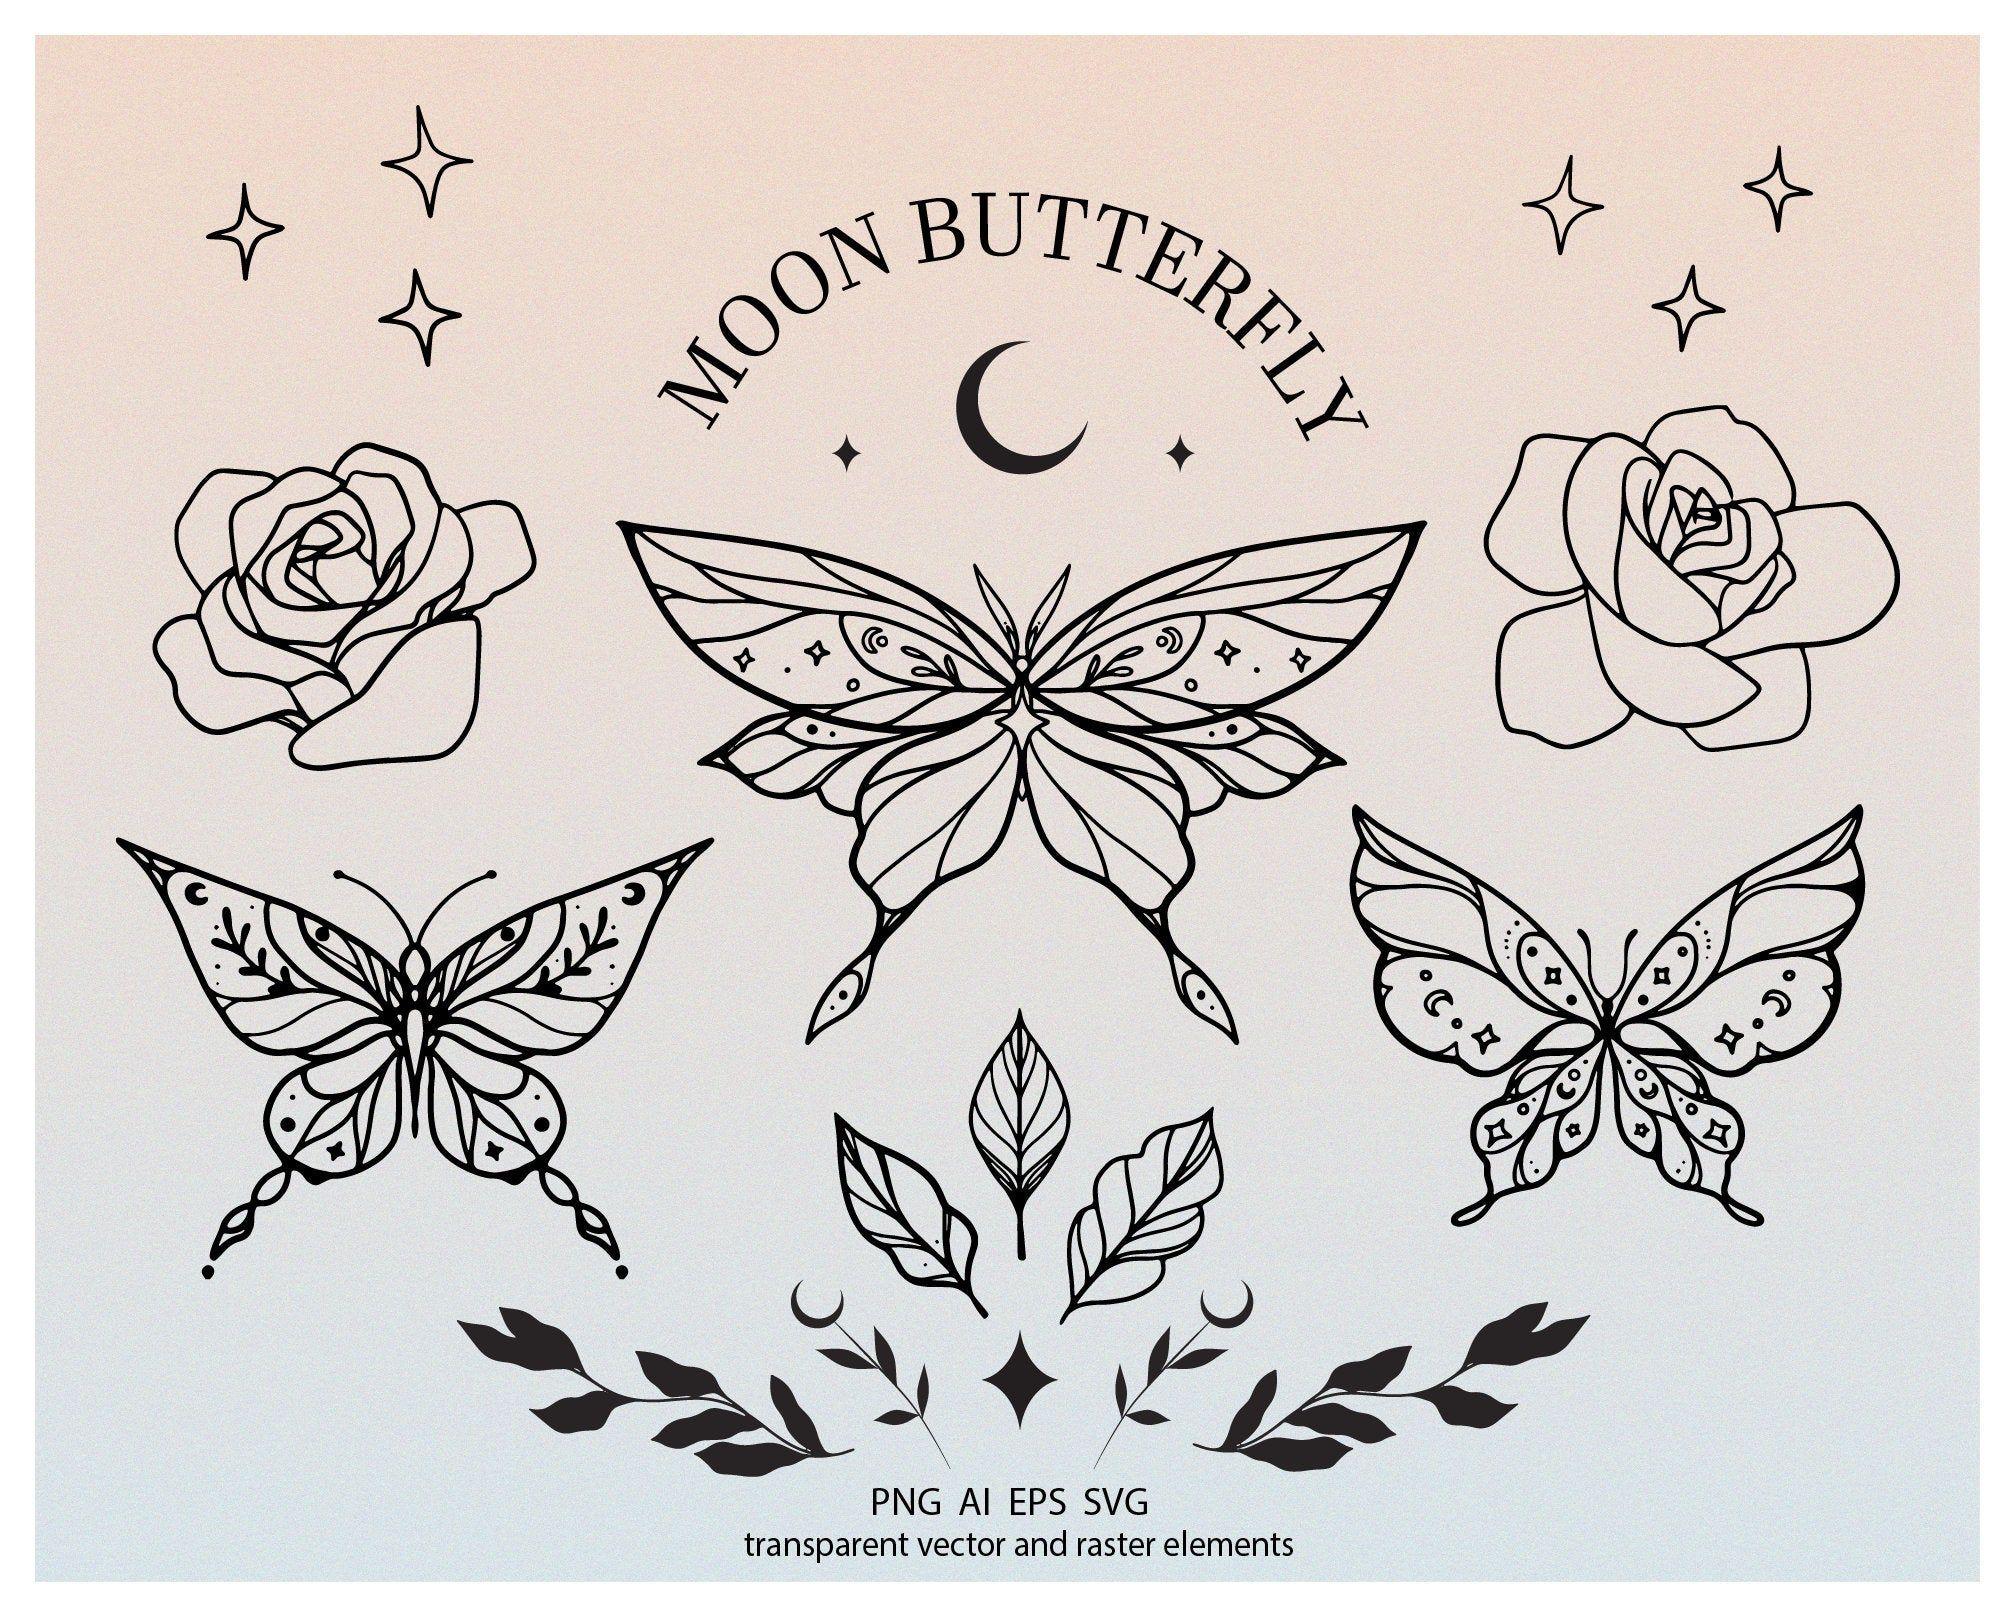 Moon boho butterfly logo elements set, transparent png, moth clipart, mystery halloween